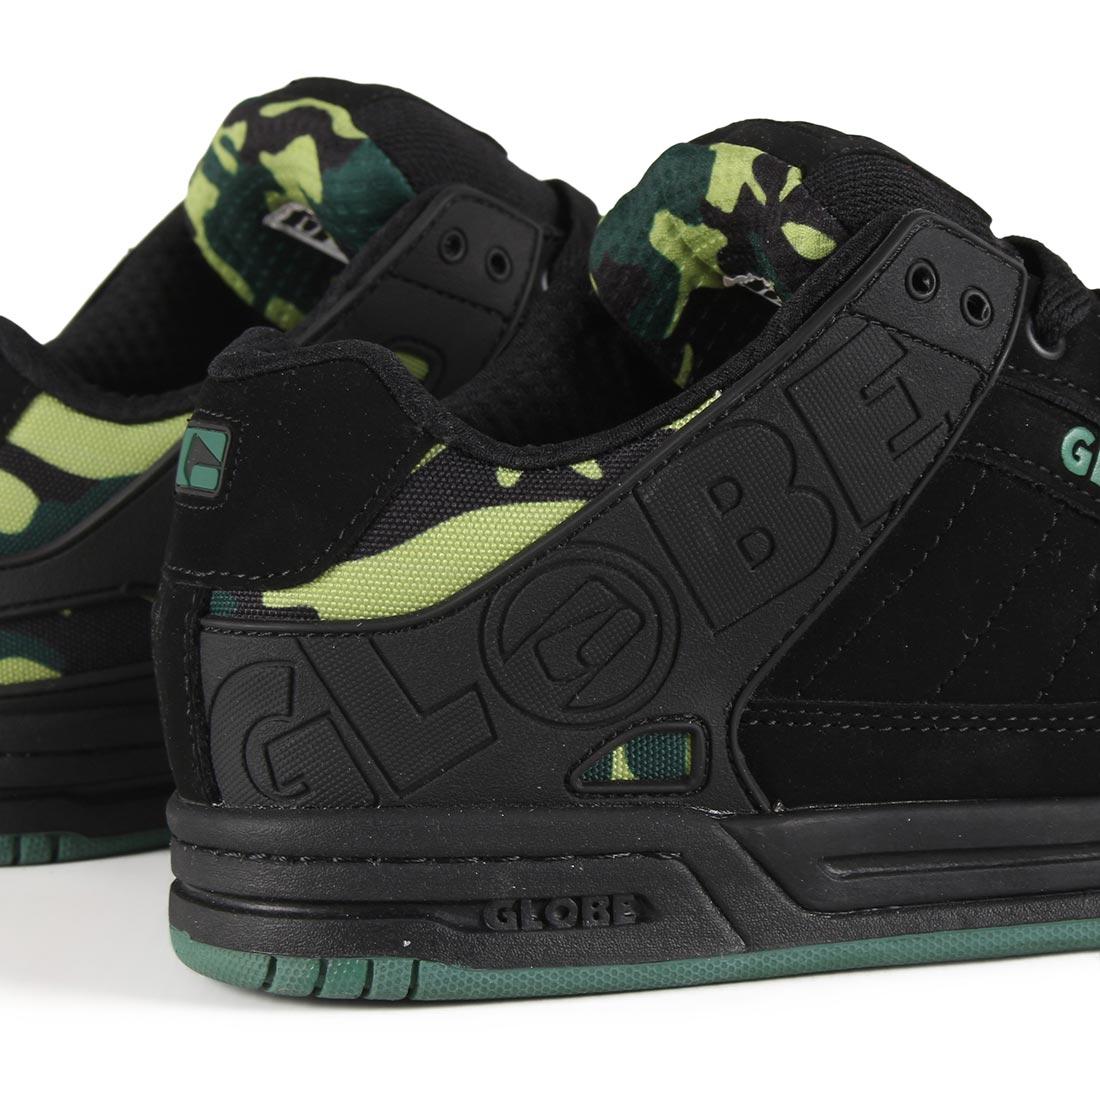 a01e38721c73 ... Globe-Tilt-Shoes-Black-Black-Camo- ...